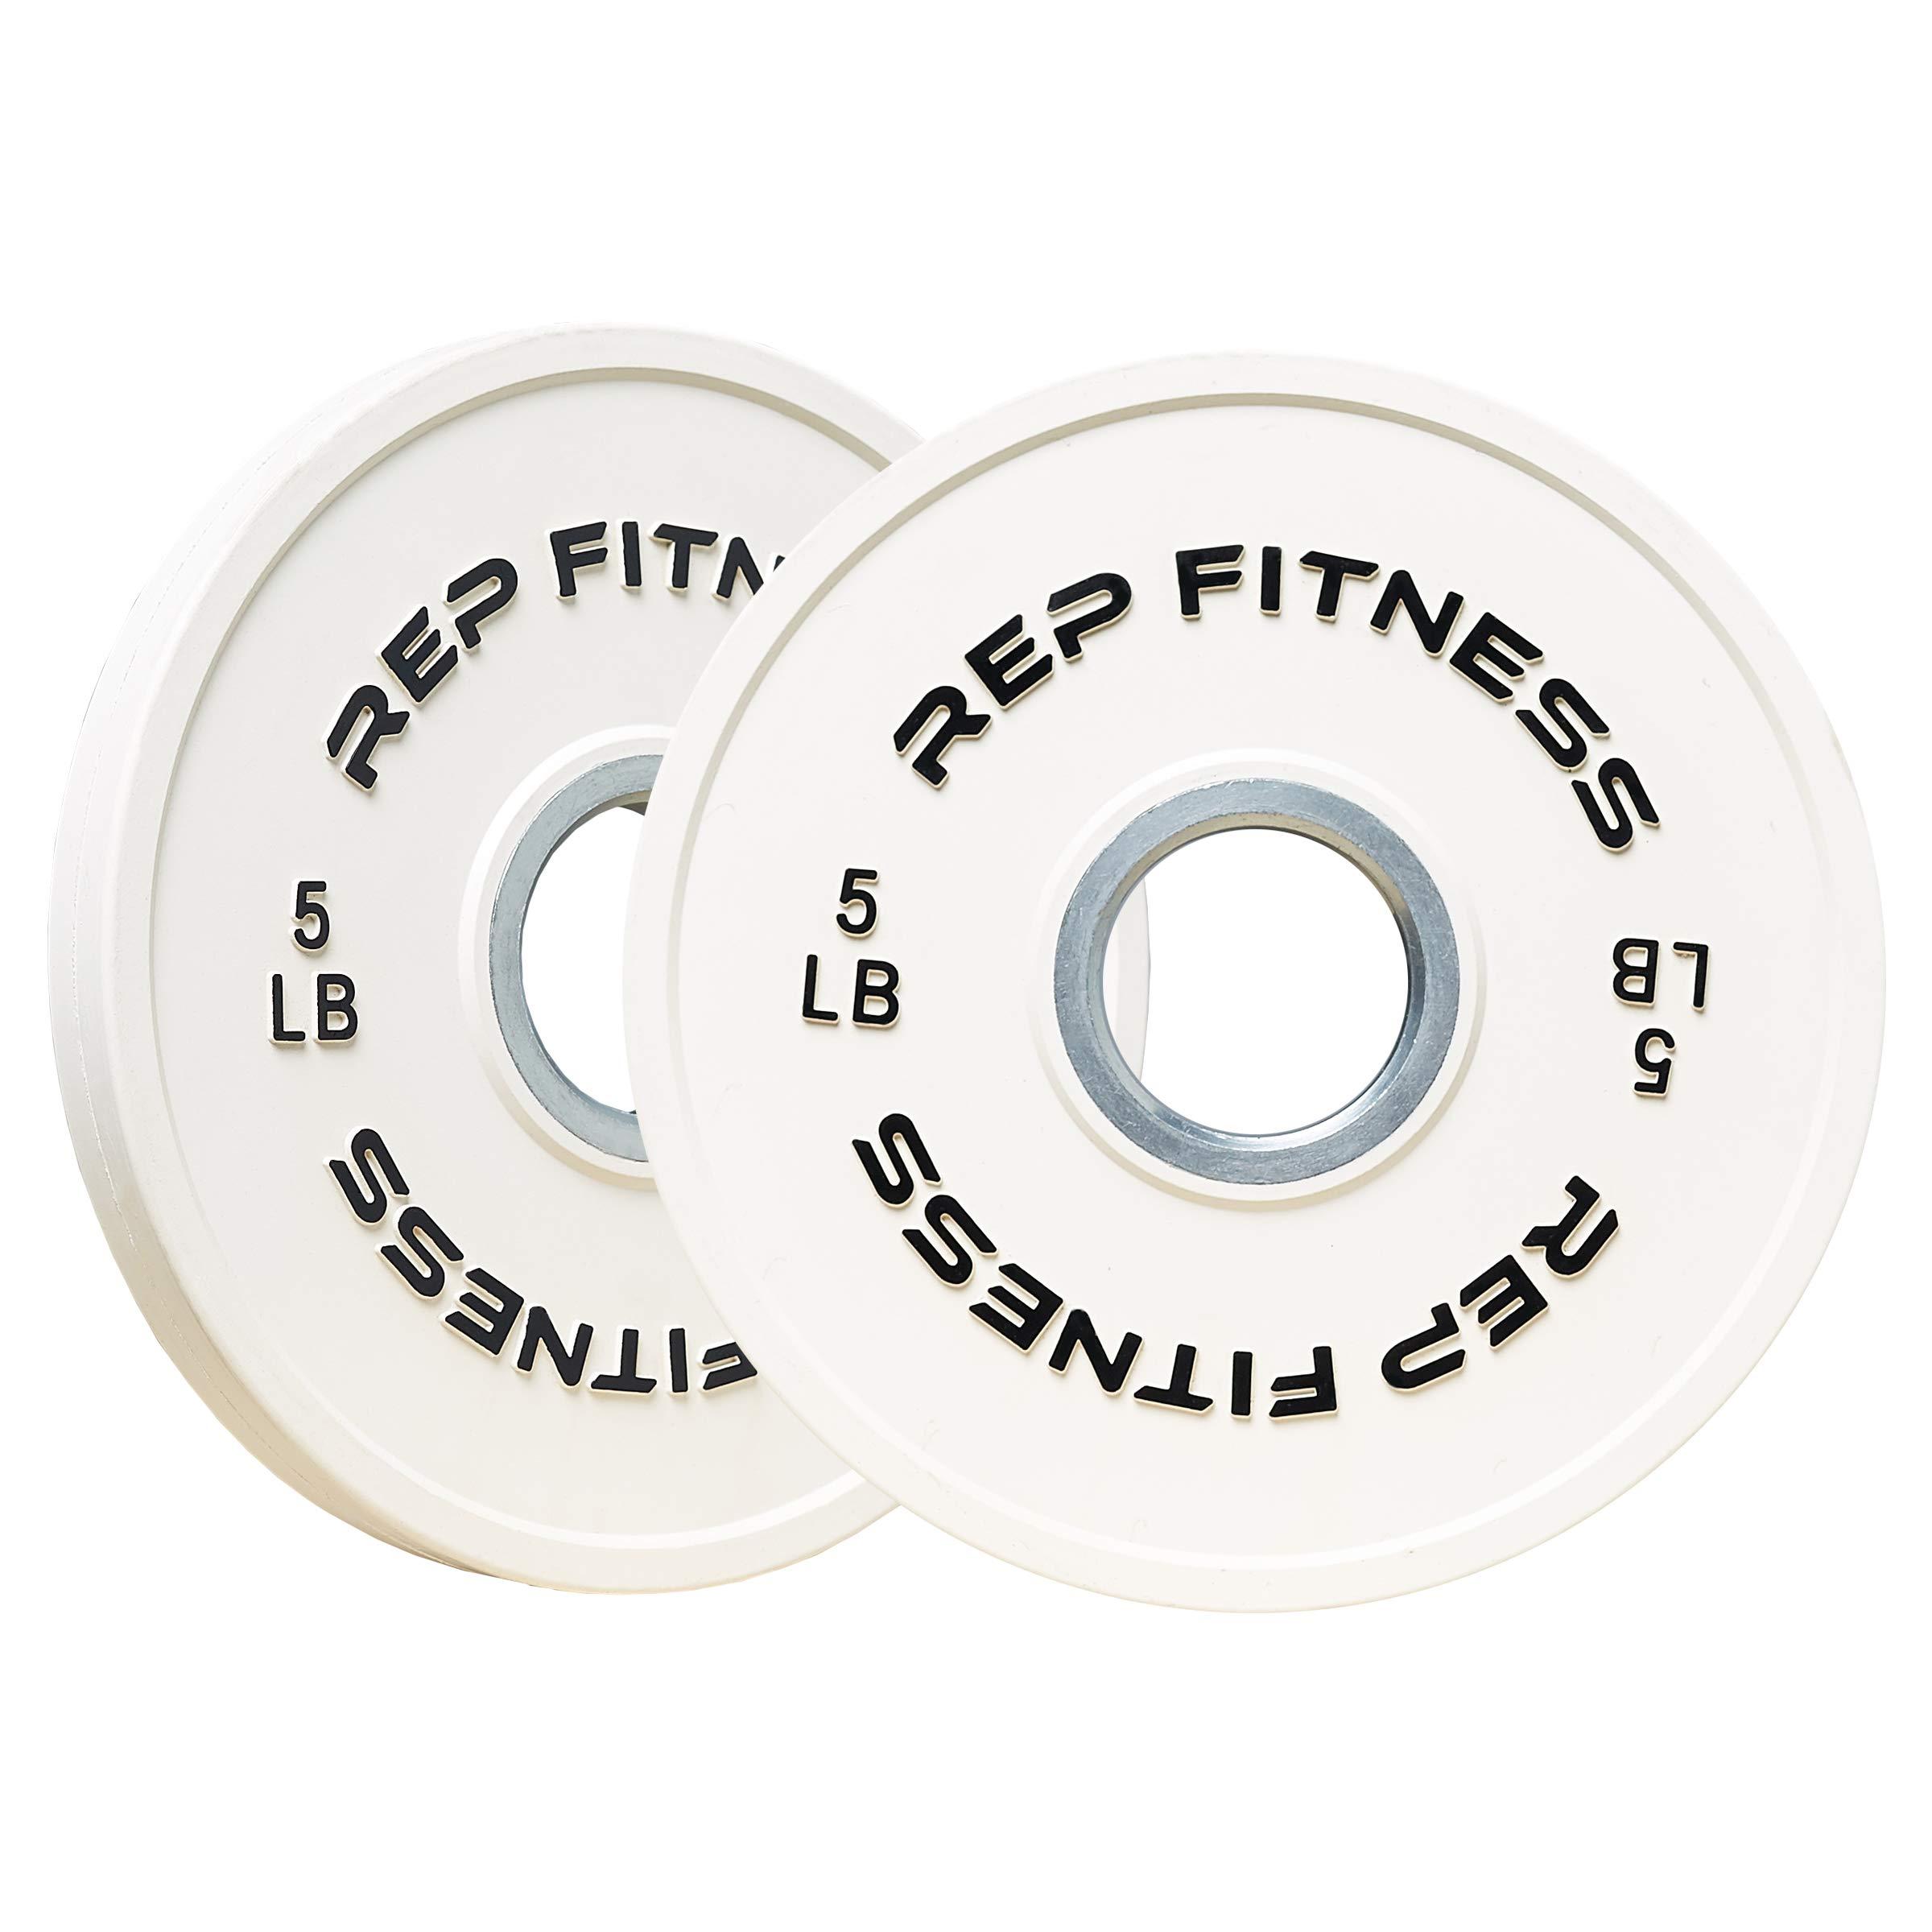 Rep Change Plates - 5.0 lb